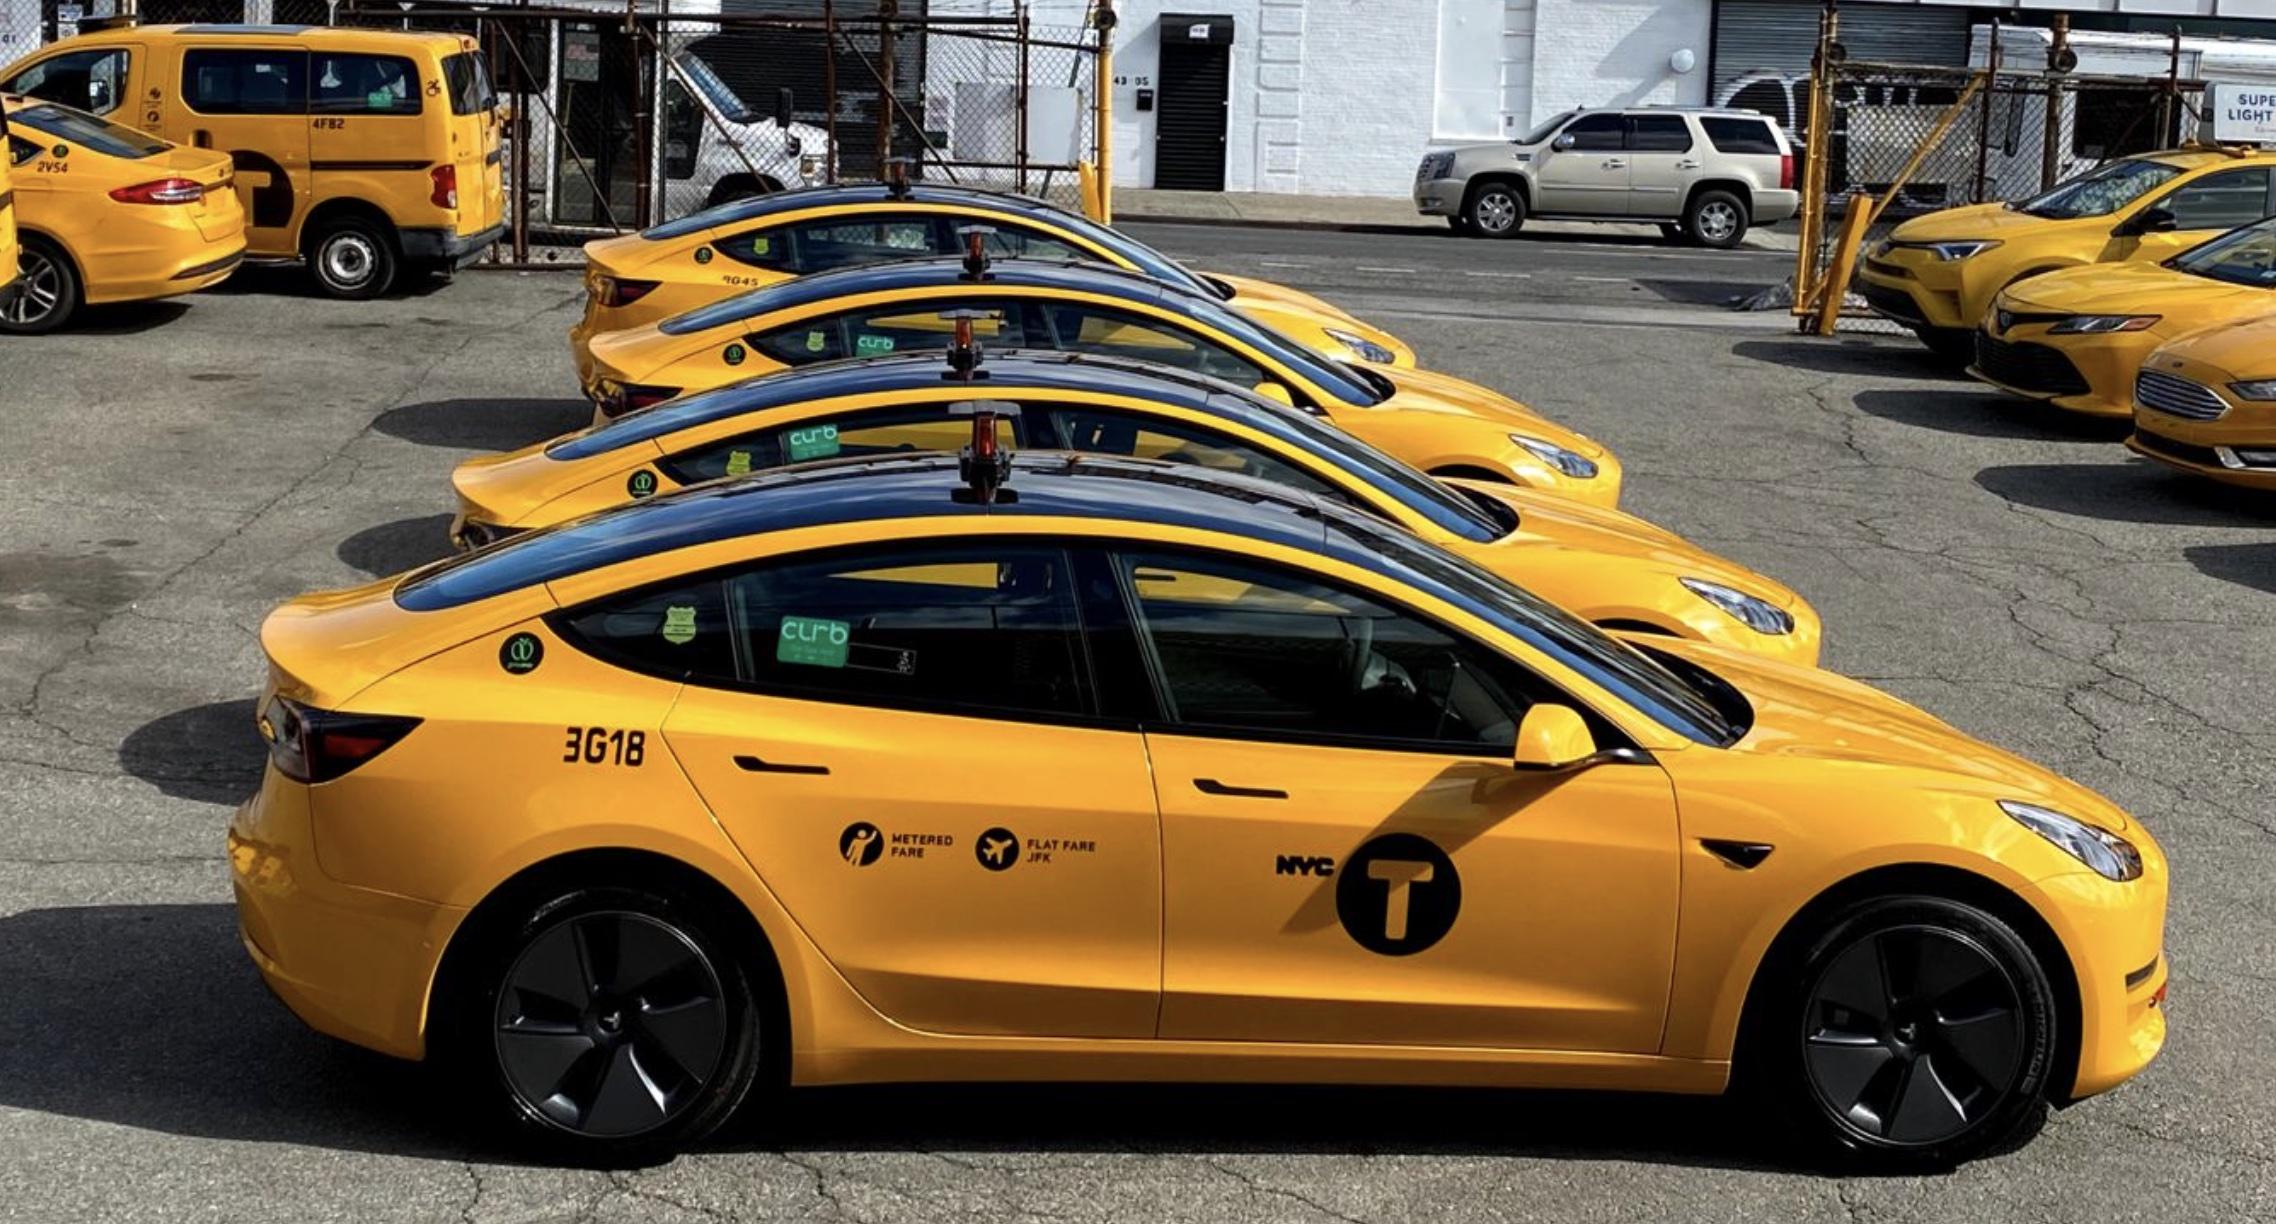 Telsa-model-3-yellow-taxi